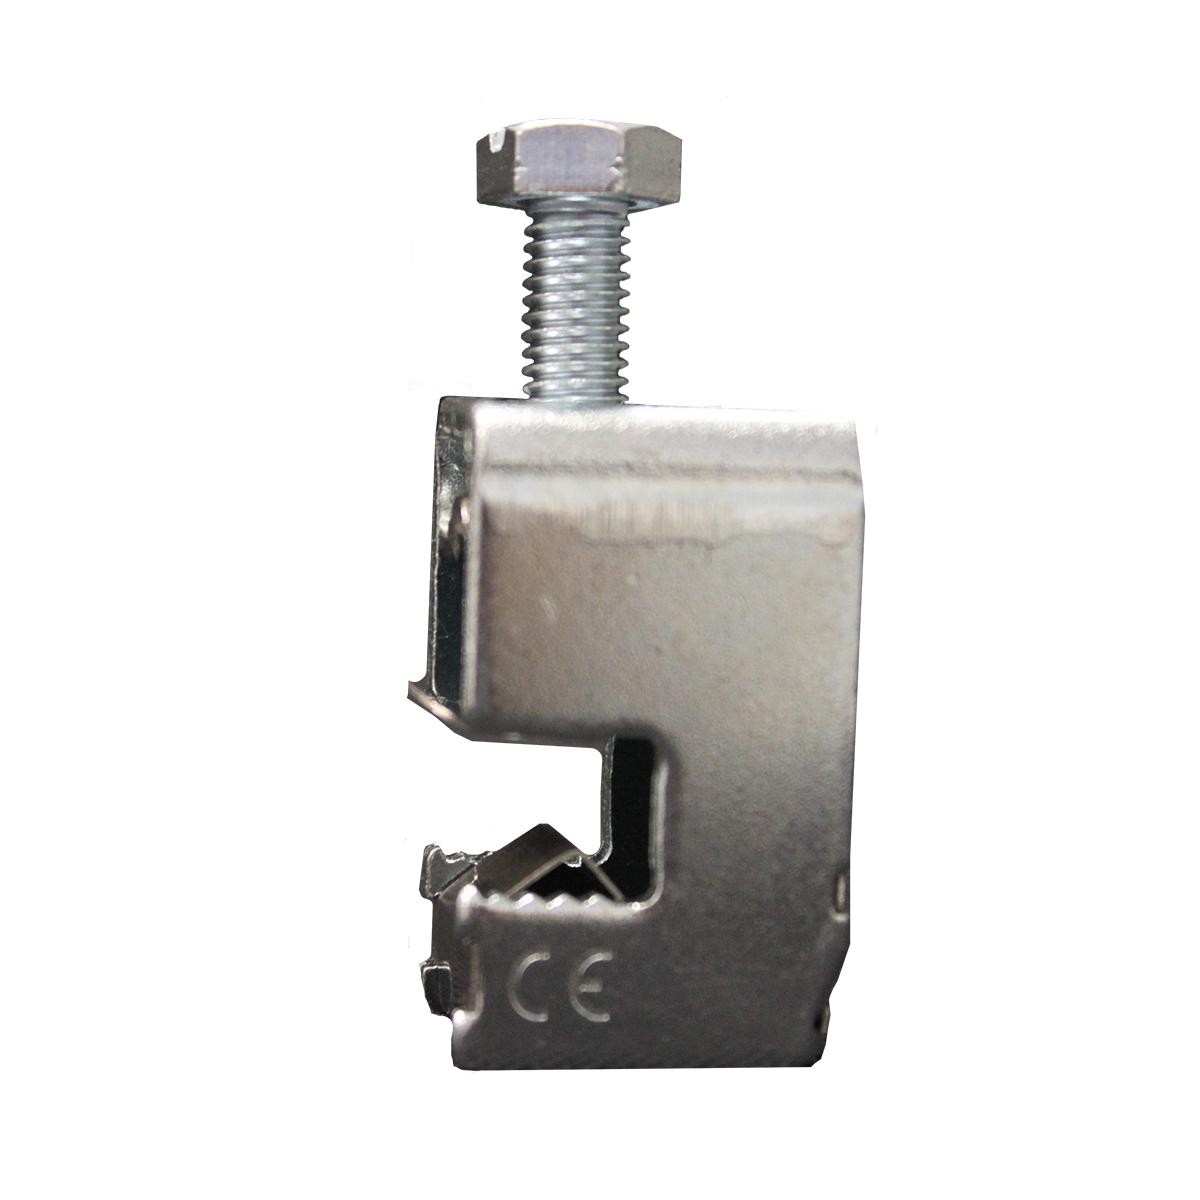 1 Stk Alu-Kupfer-Leiteranschlußklemme 16 -70mm² / 10mm² IS5057010-